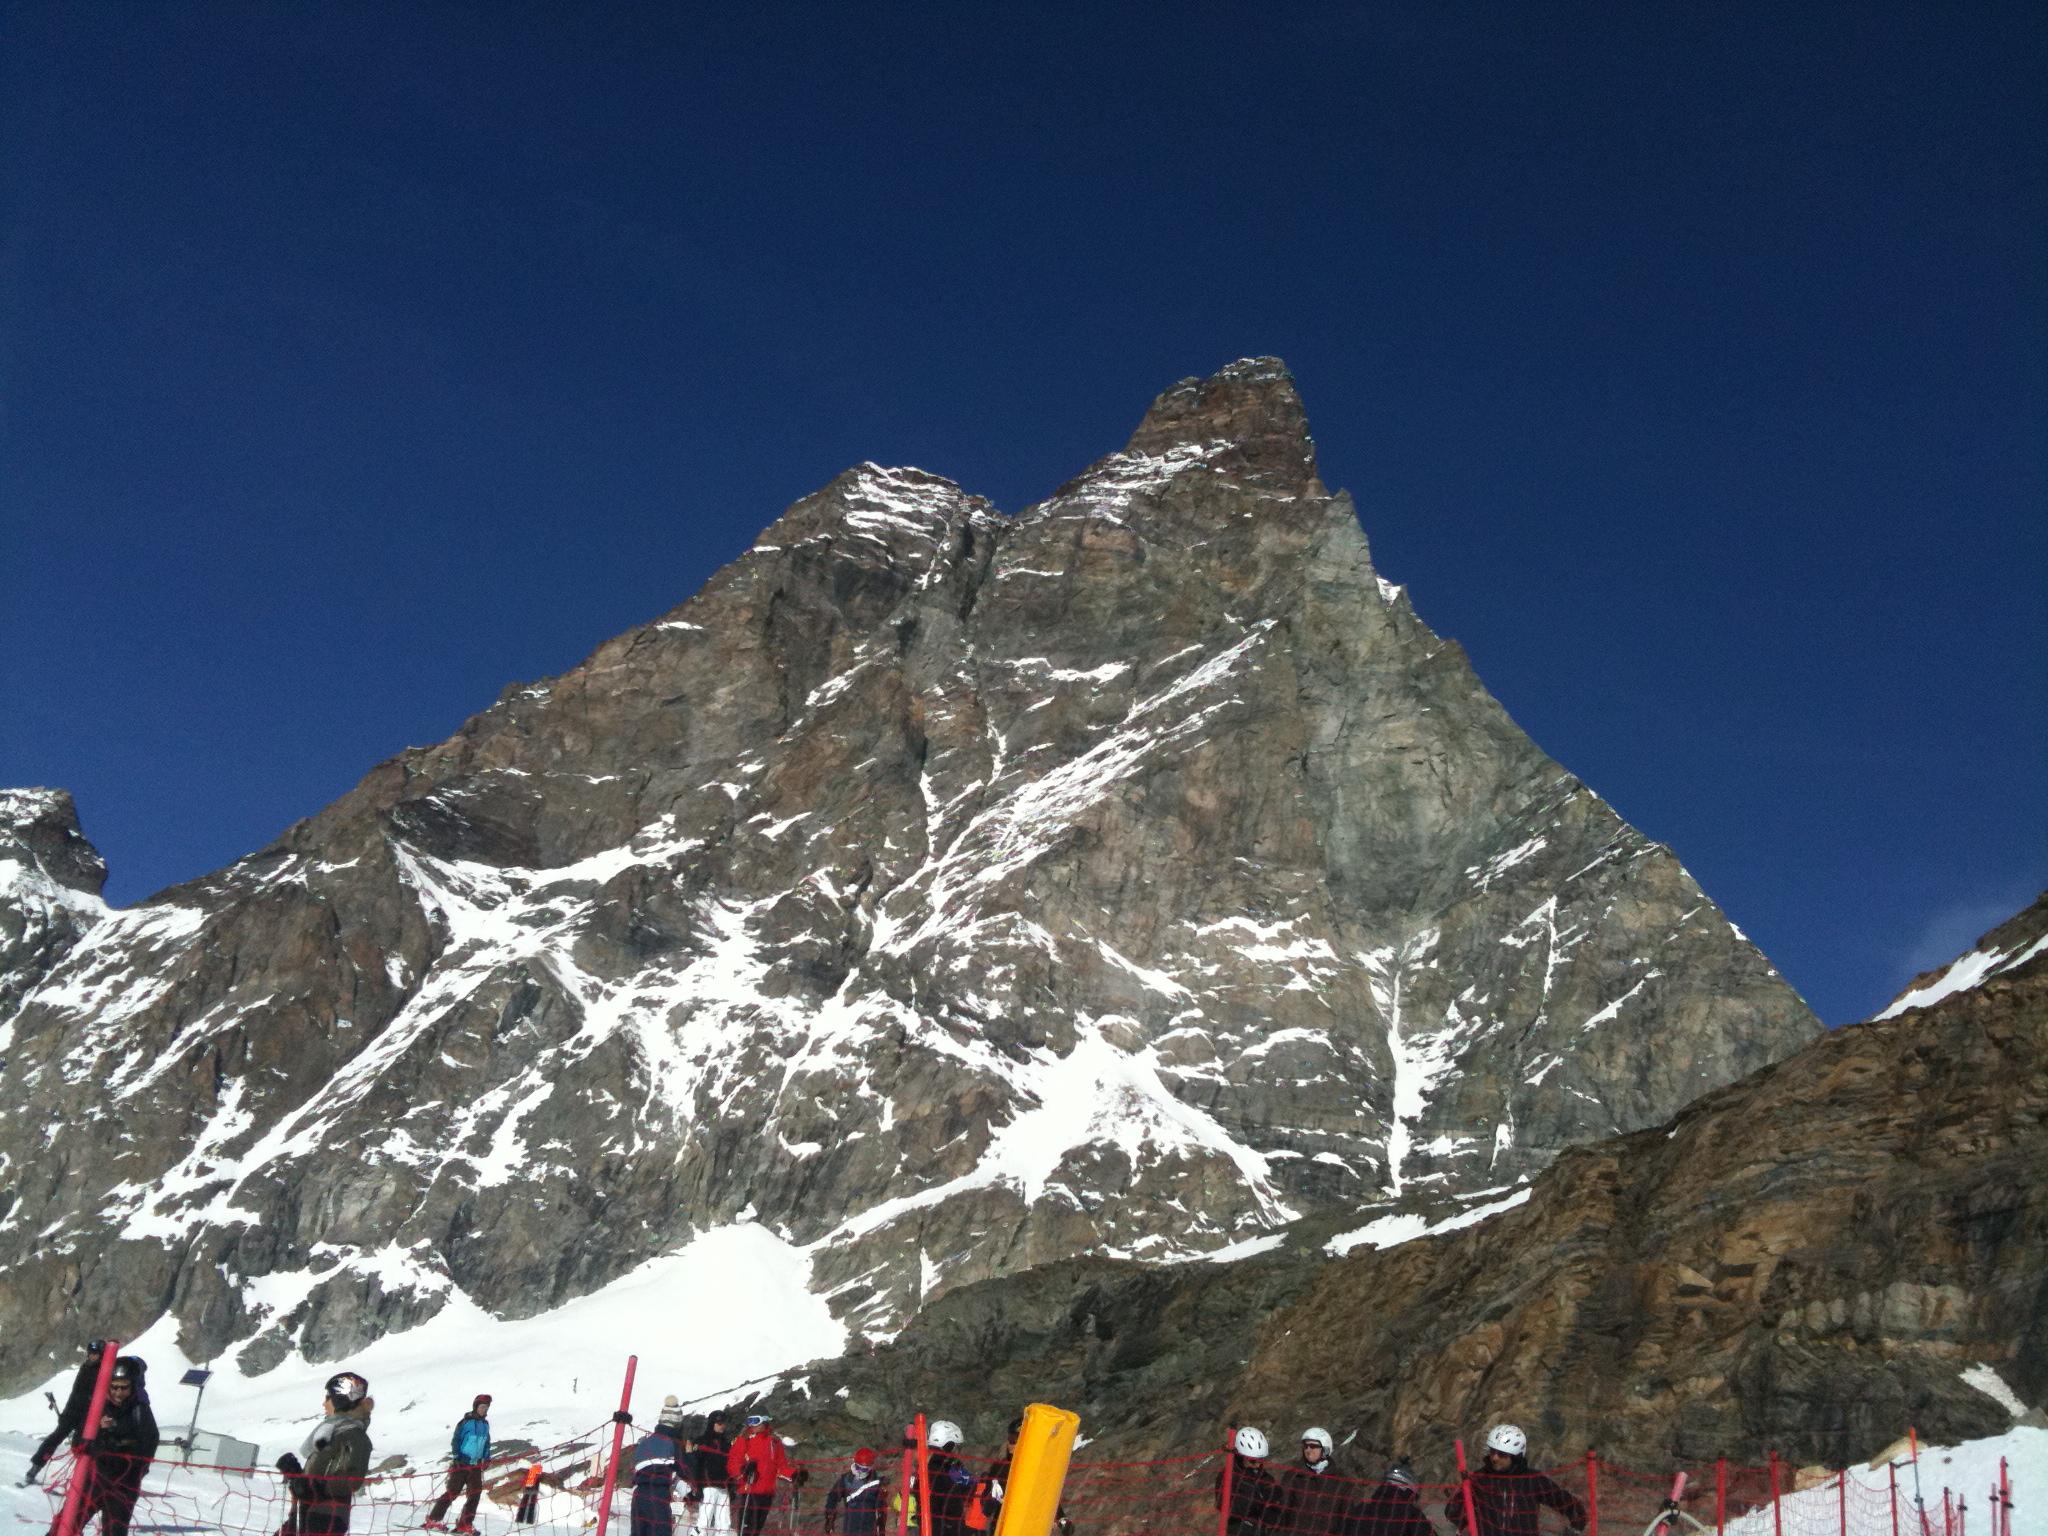 On the way back to Zermatt